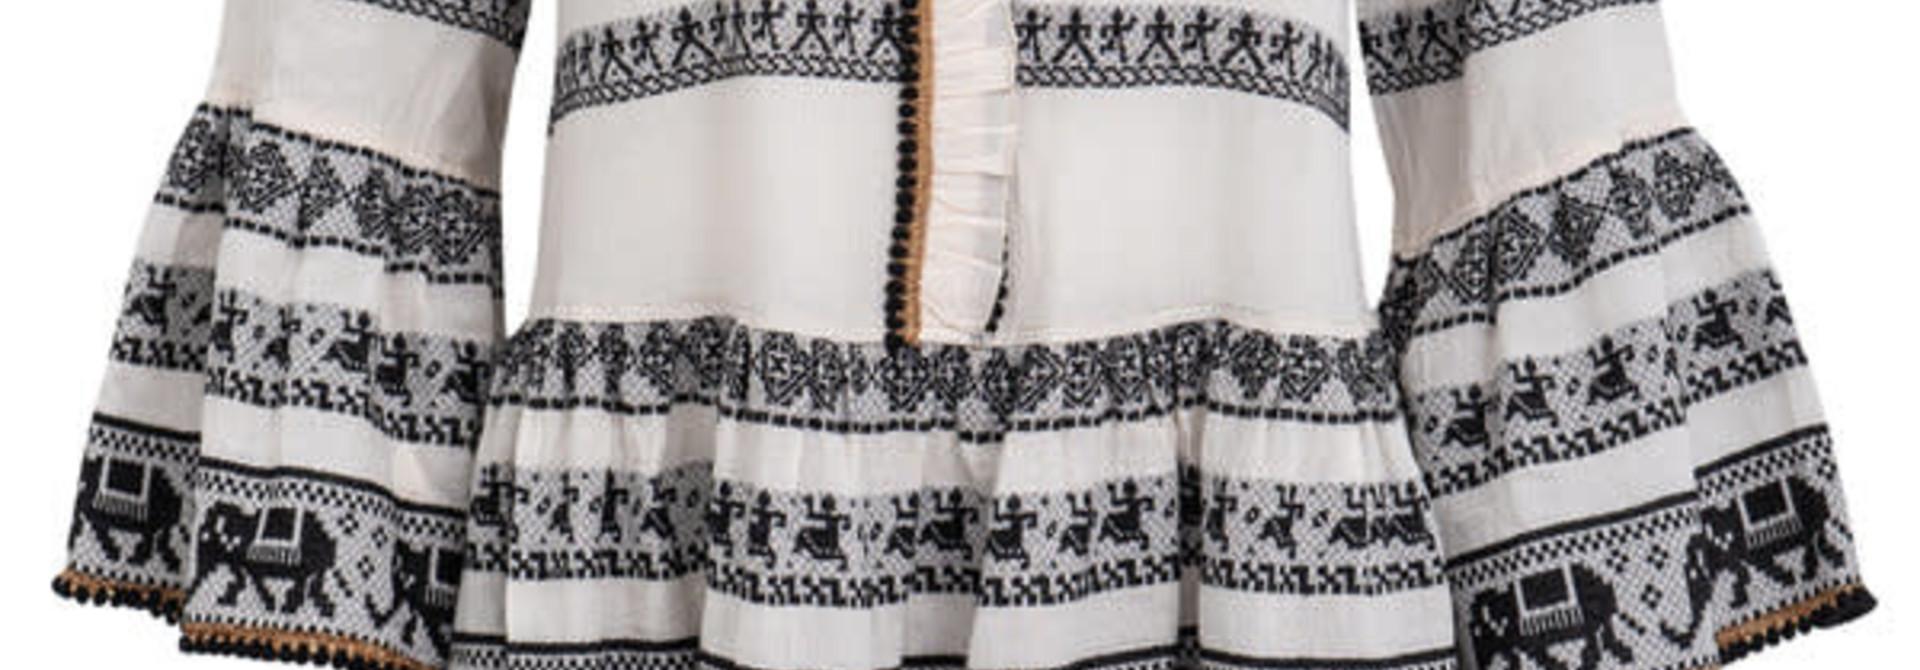 Dimitra short dress